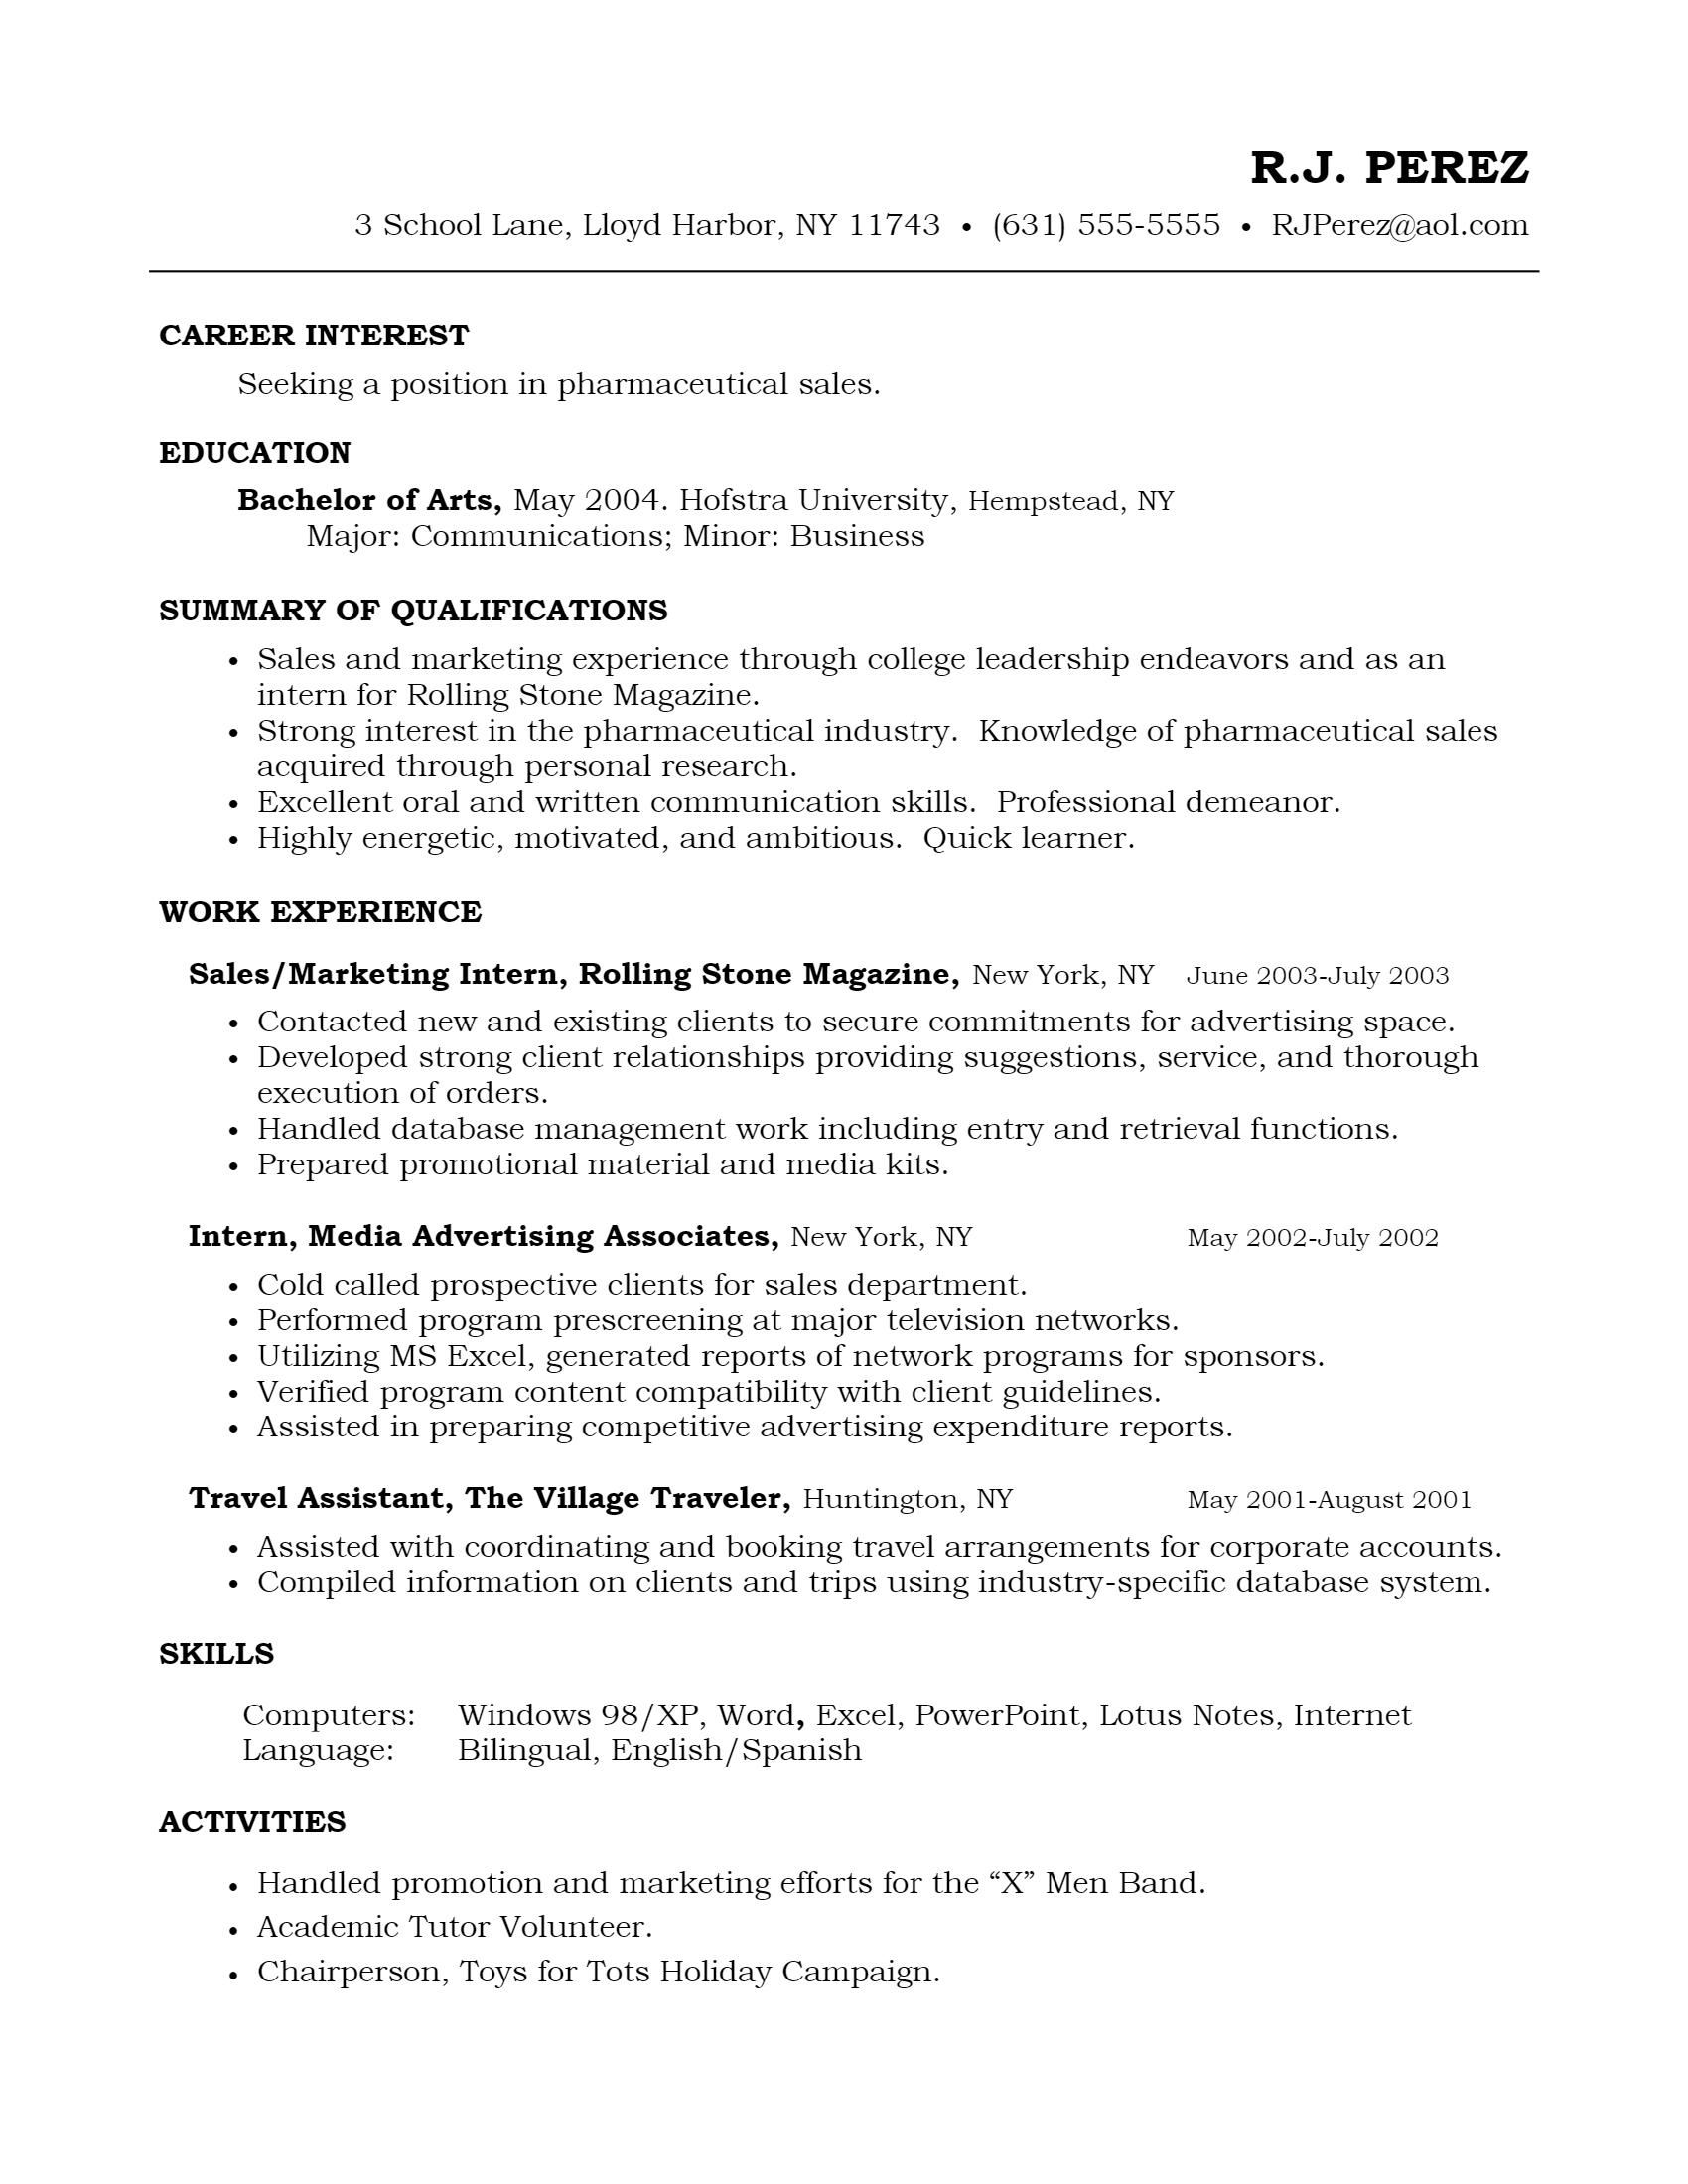 Pharmaceutical Sales Resume > Pharmaceutical Sales Resume .Docx (Word)